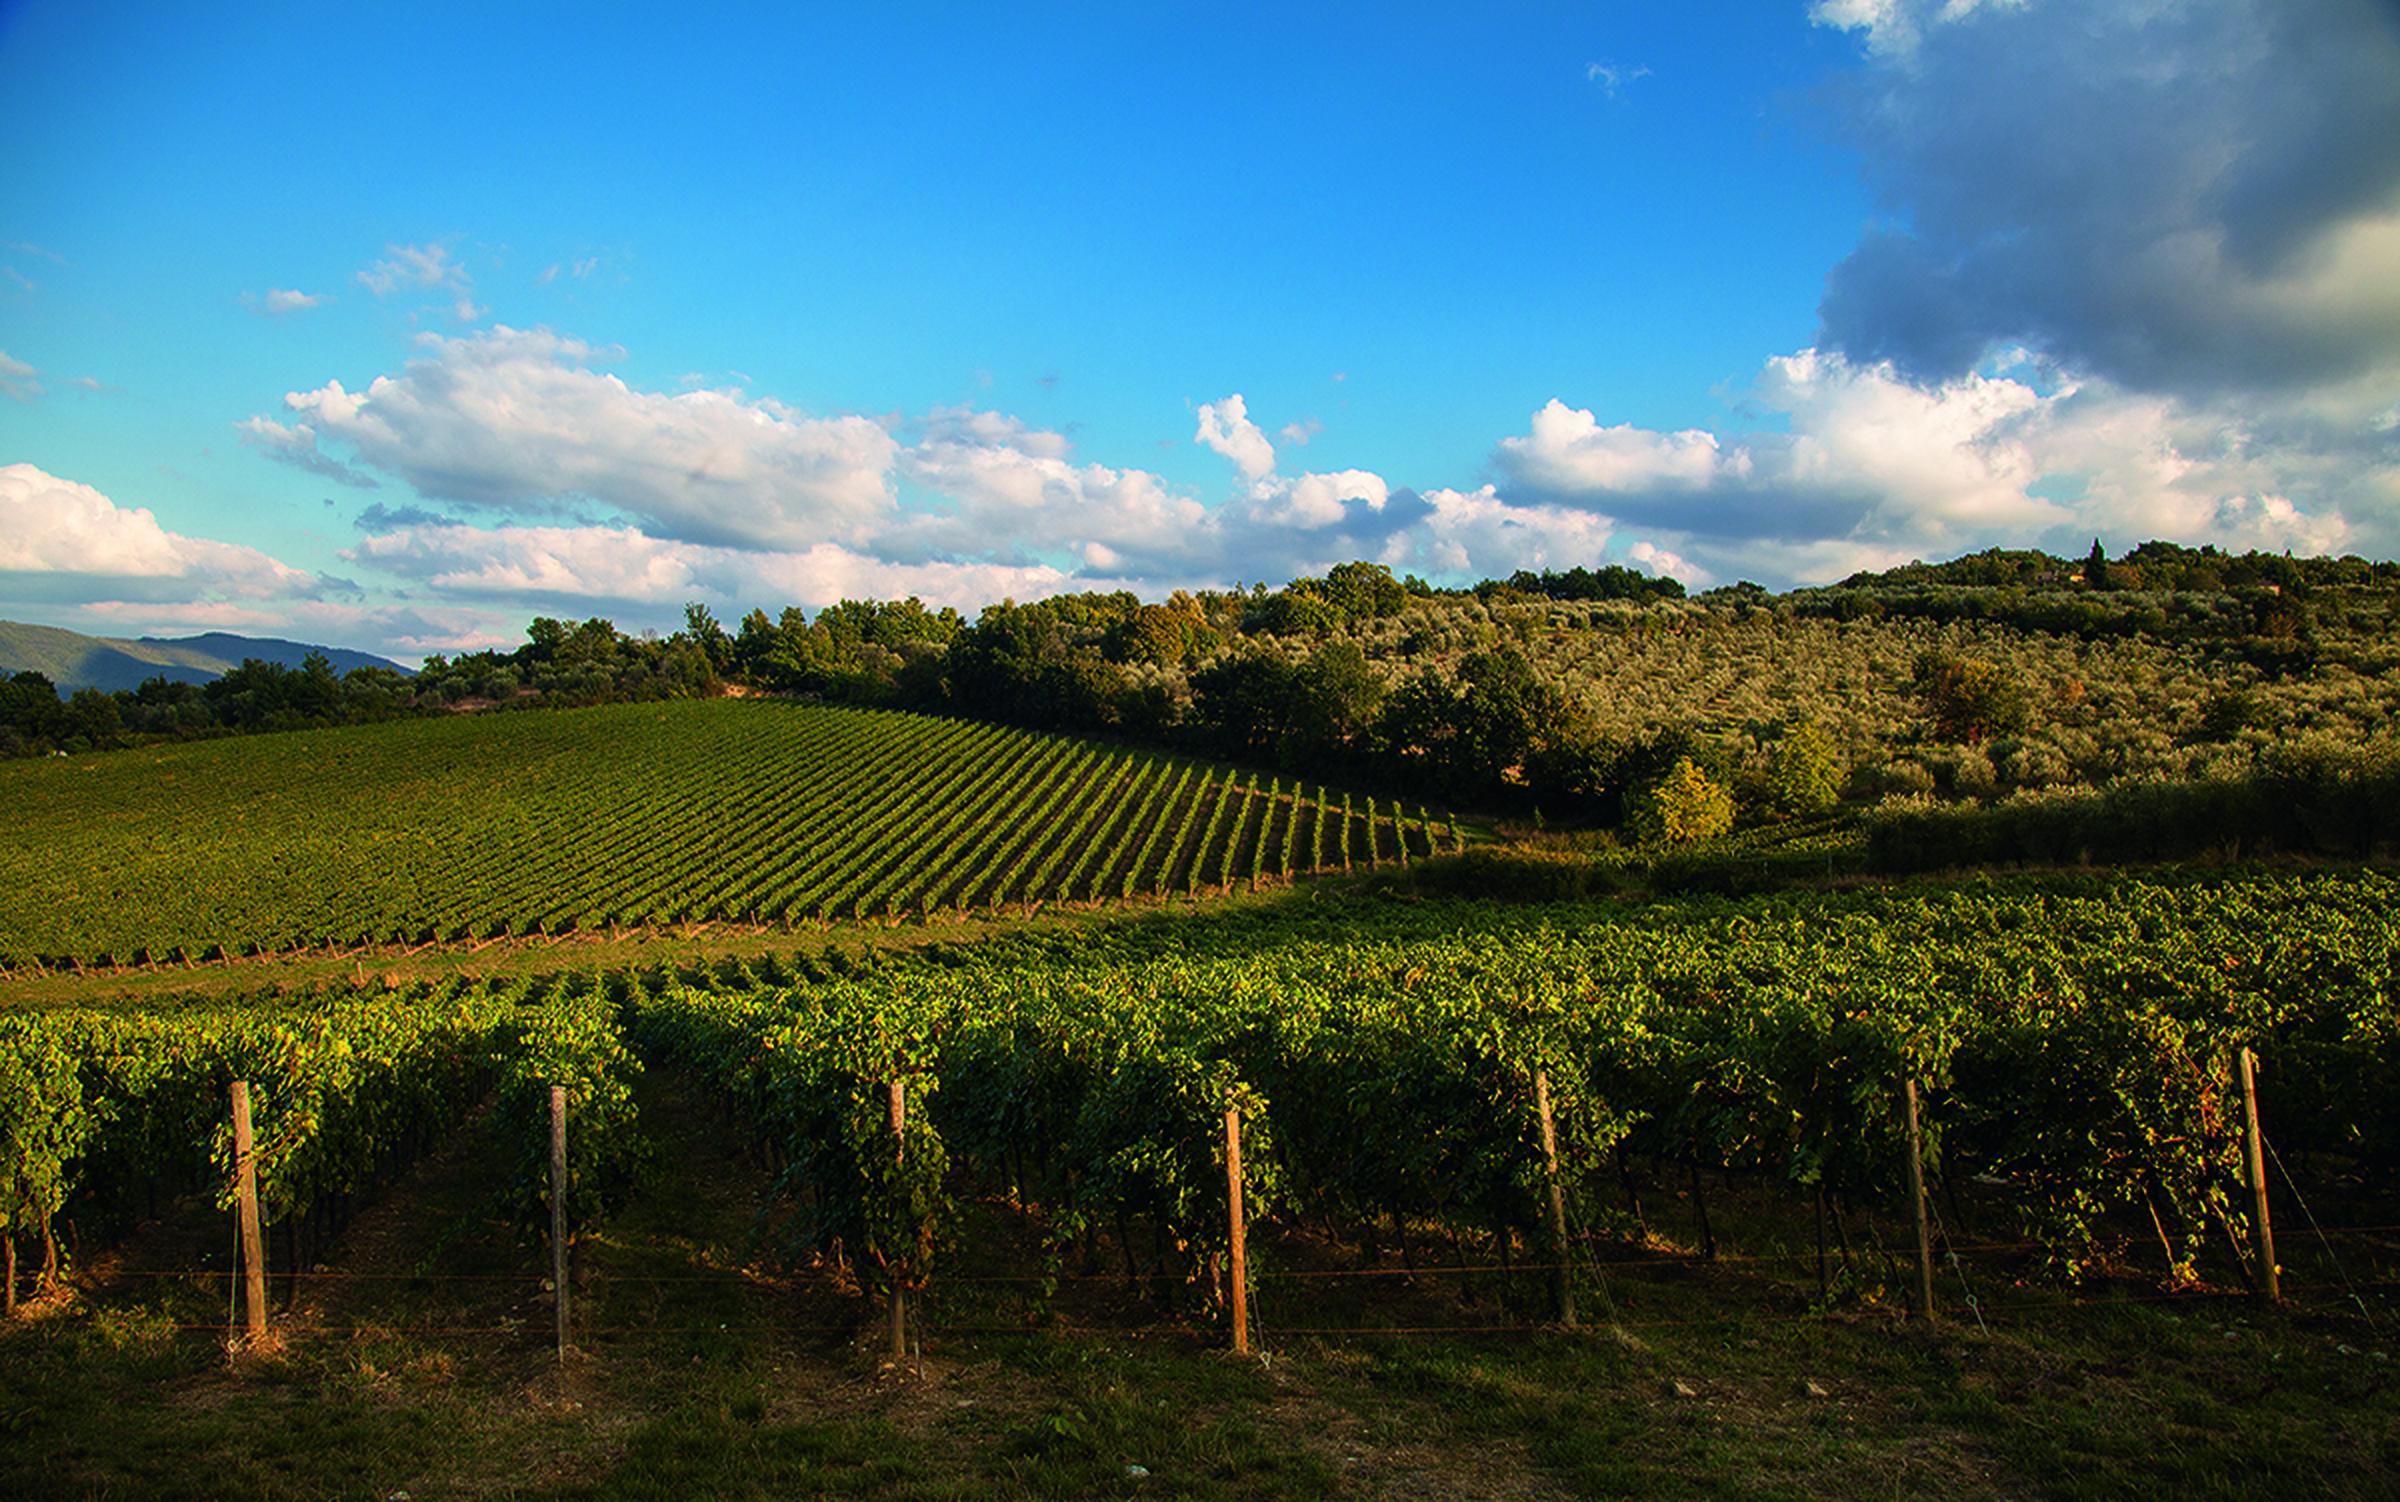 https://a.storyblok.com/f/105614/1200x751/5064e285c9/antinori-vineyards-3.jpg